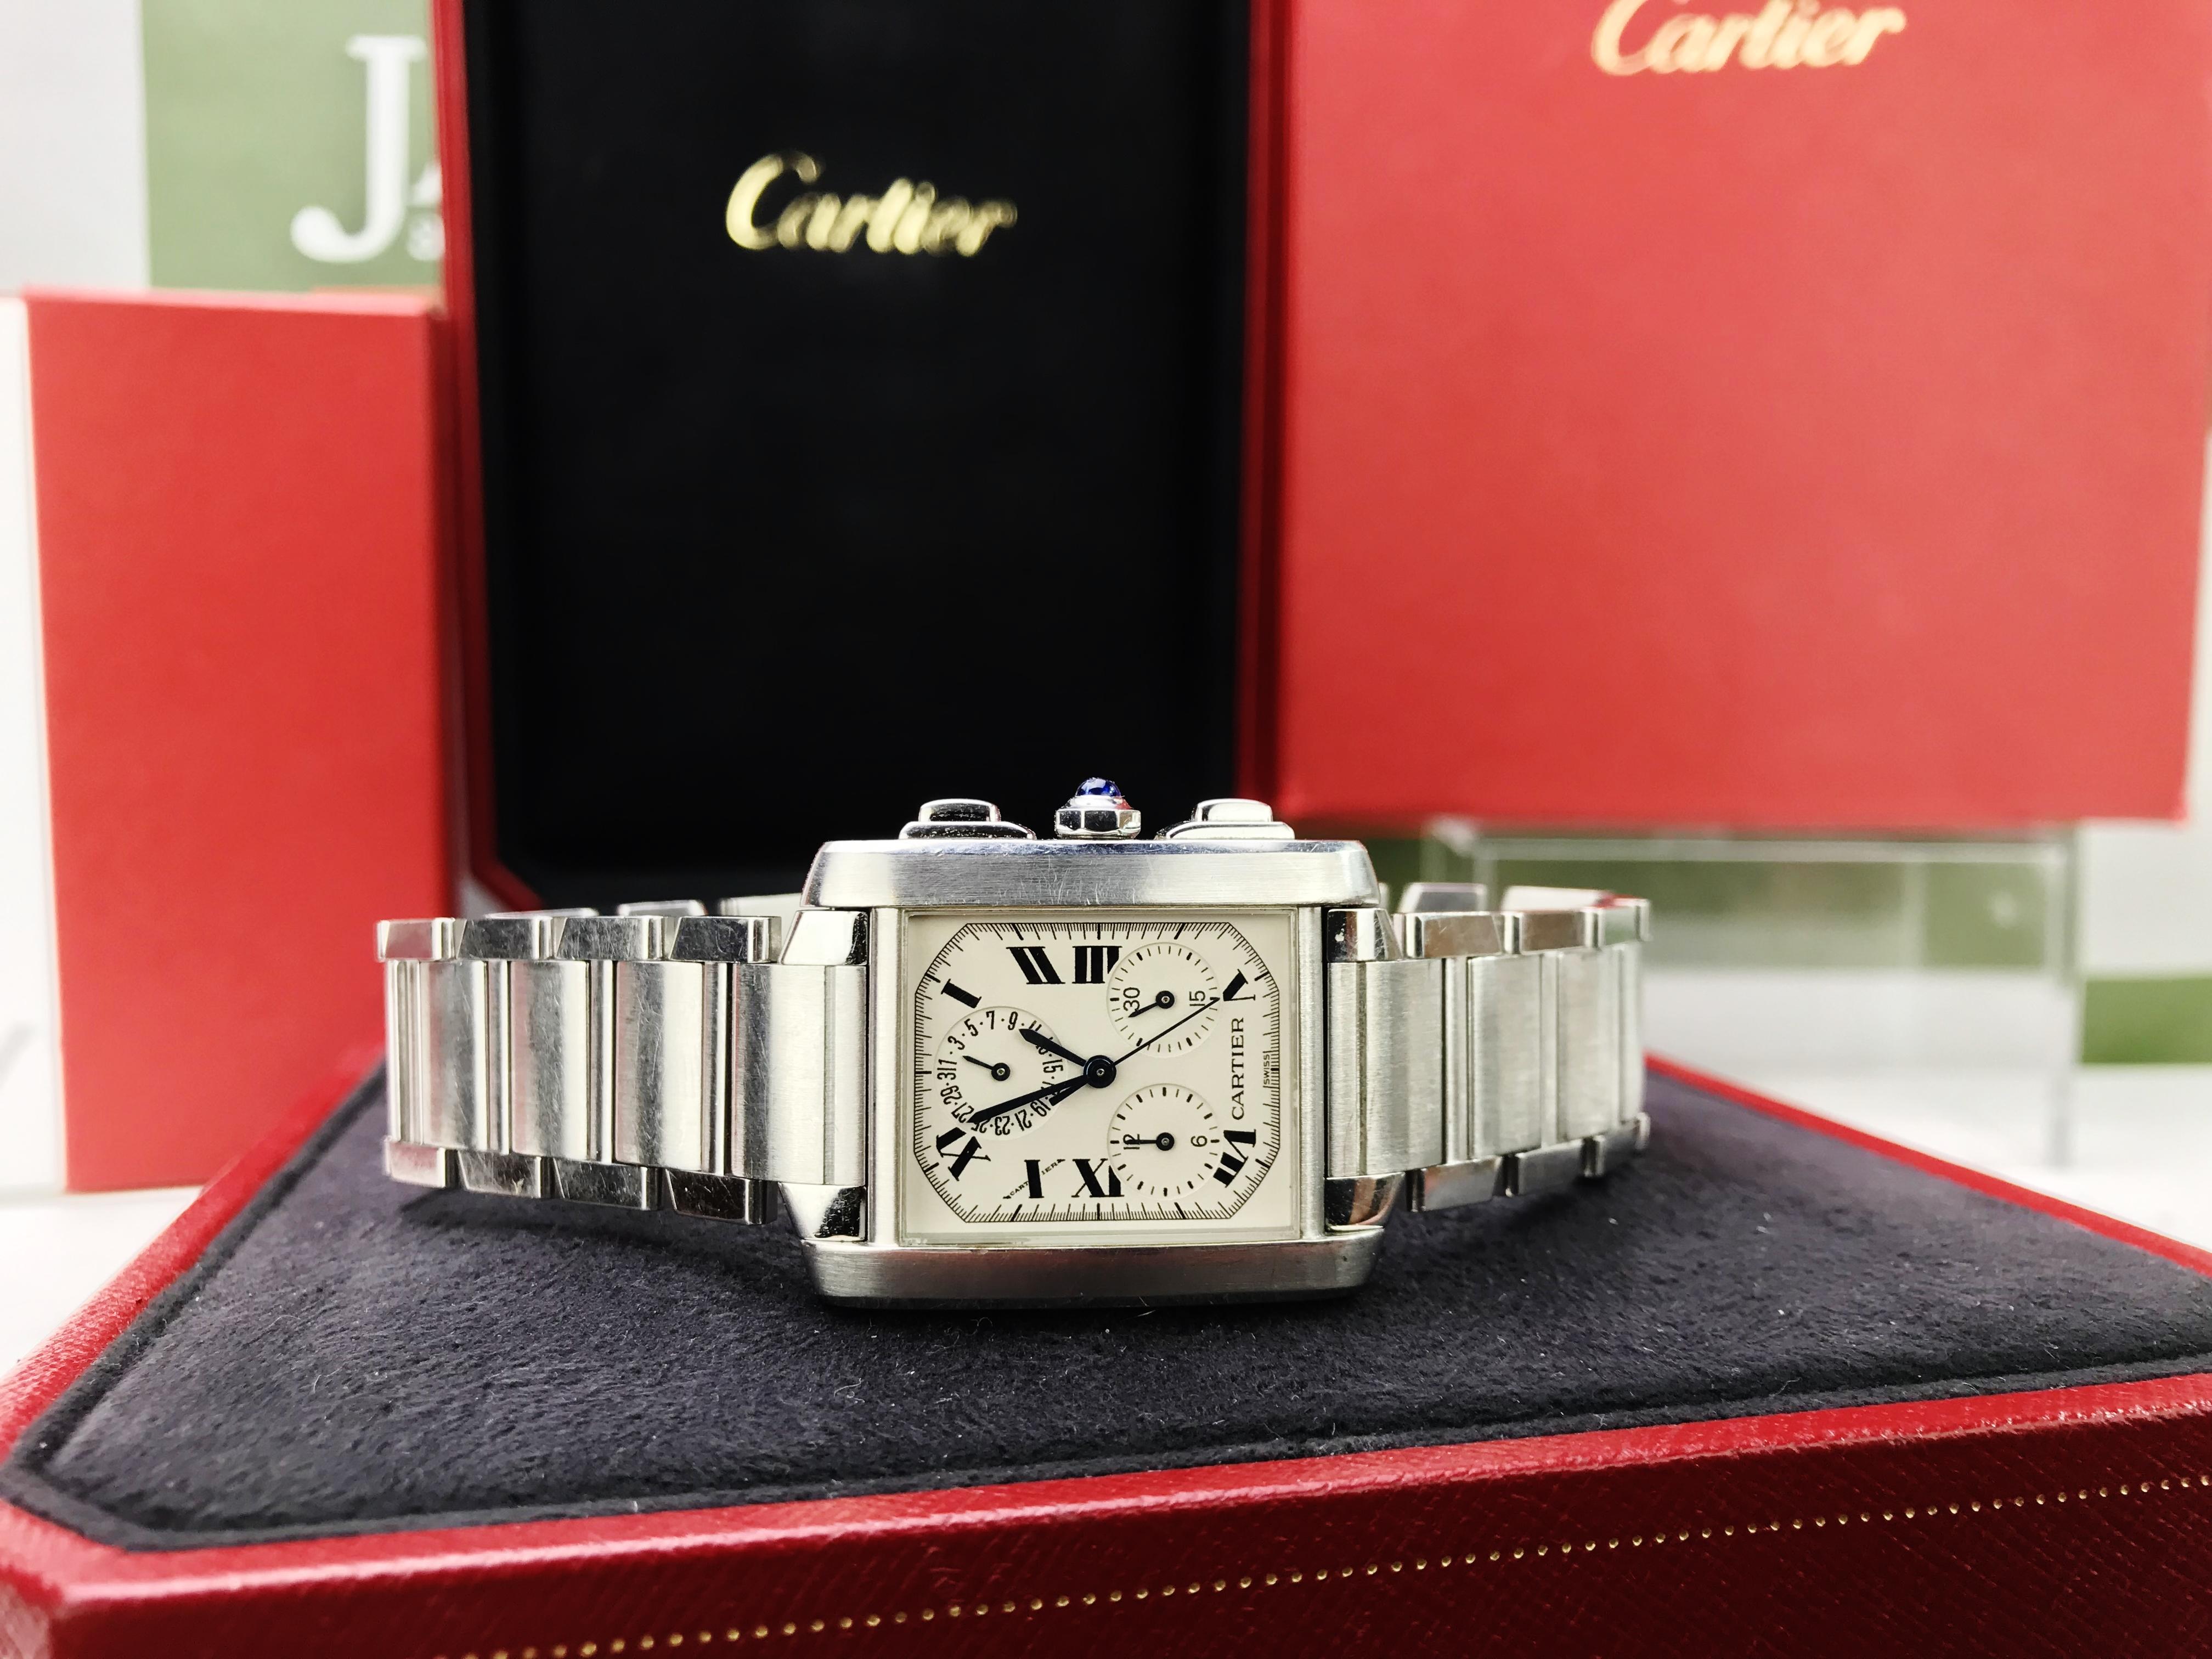 Lot 16 - Cartier Tank Francaise Chronoflex Chronograph